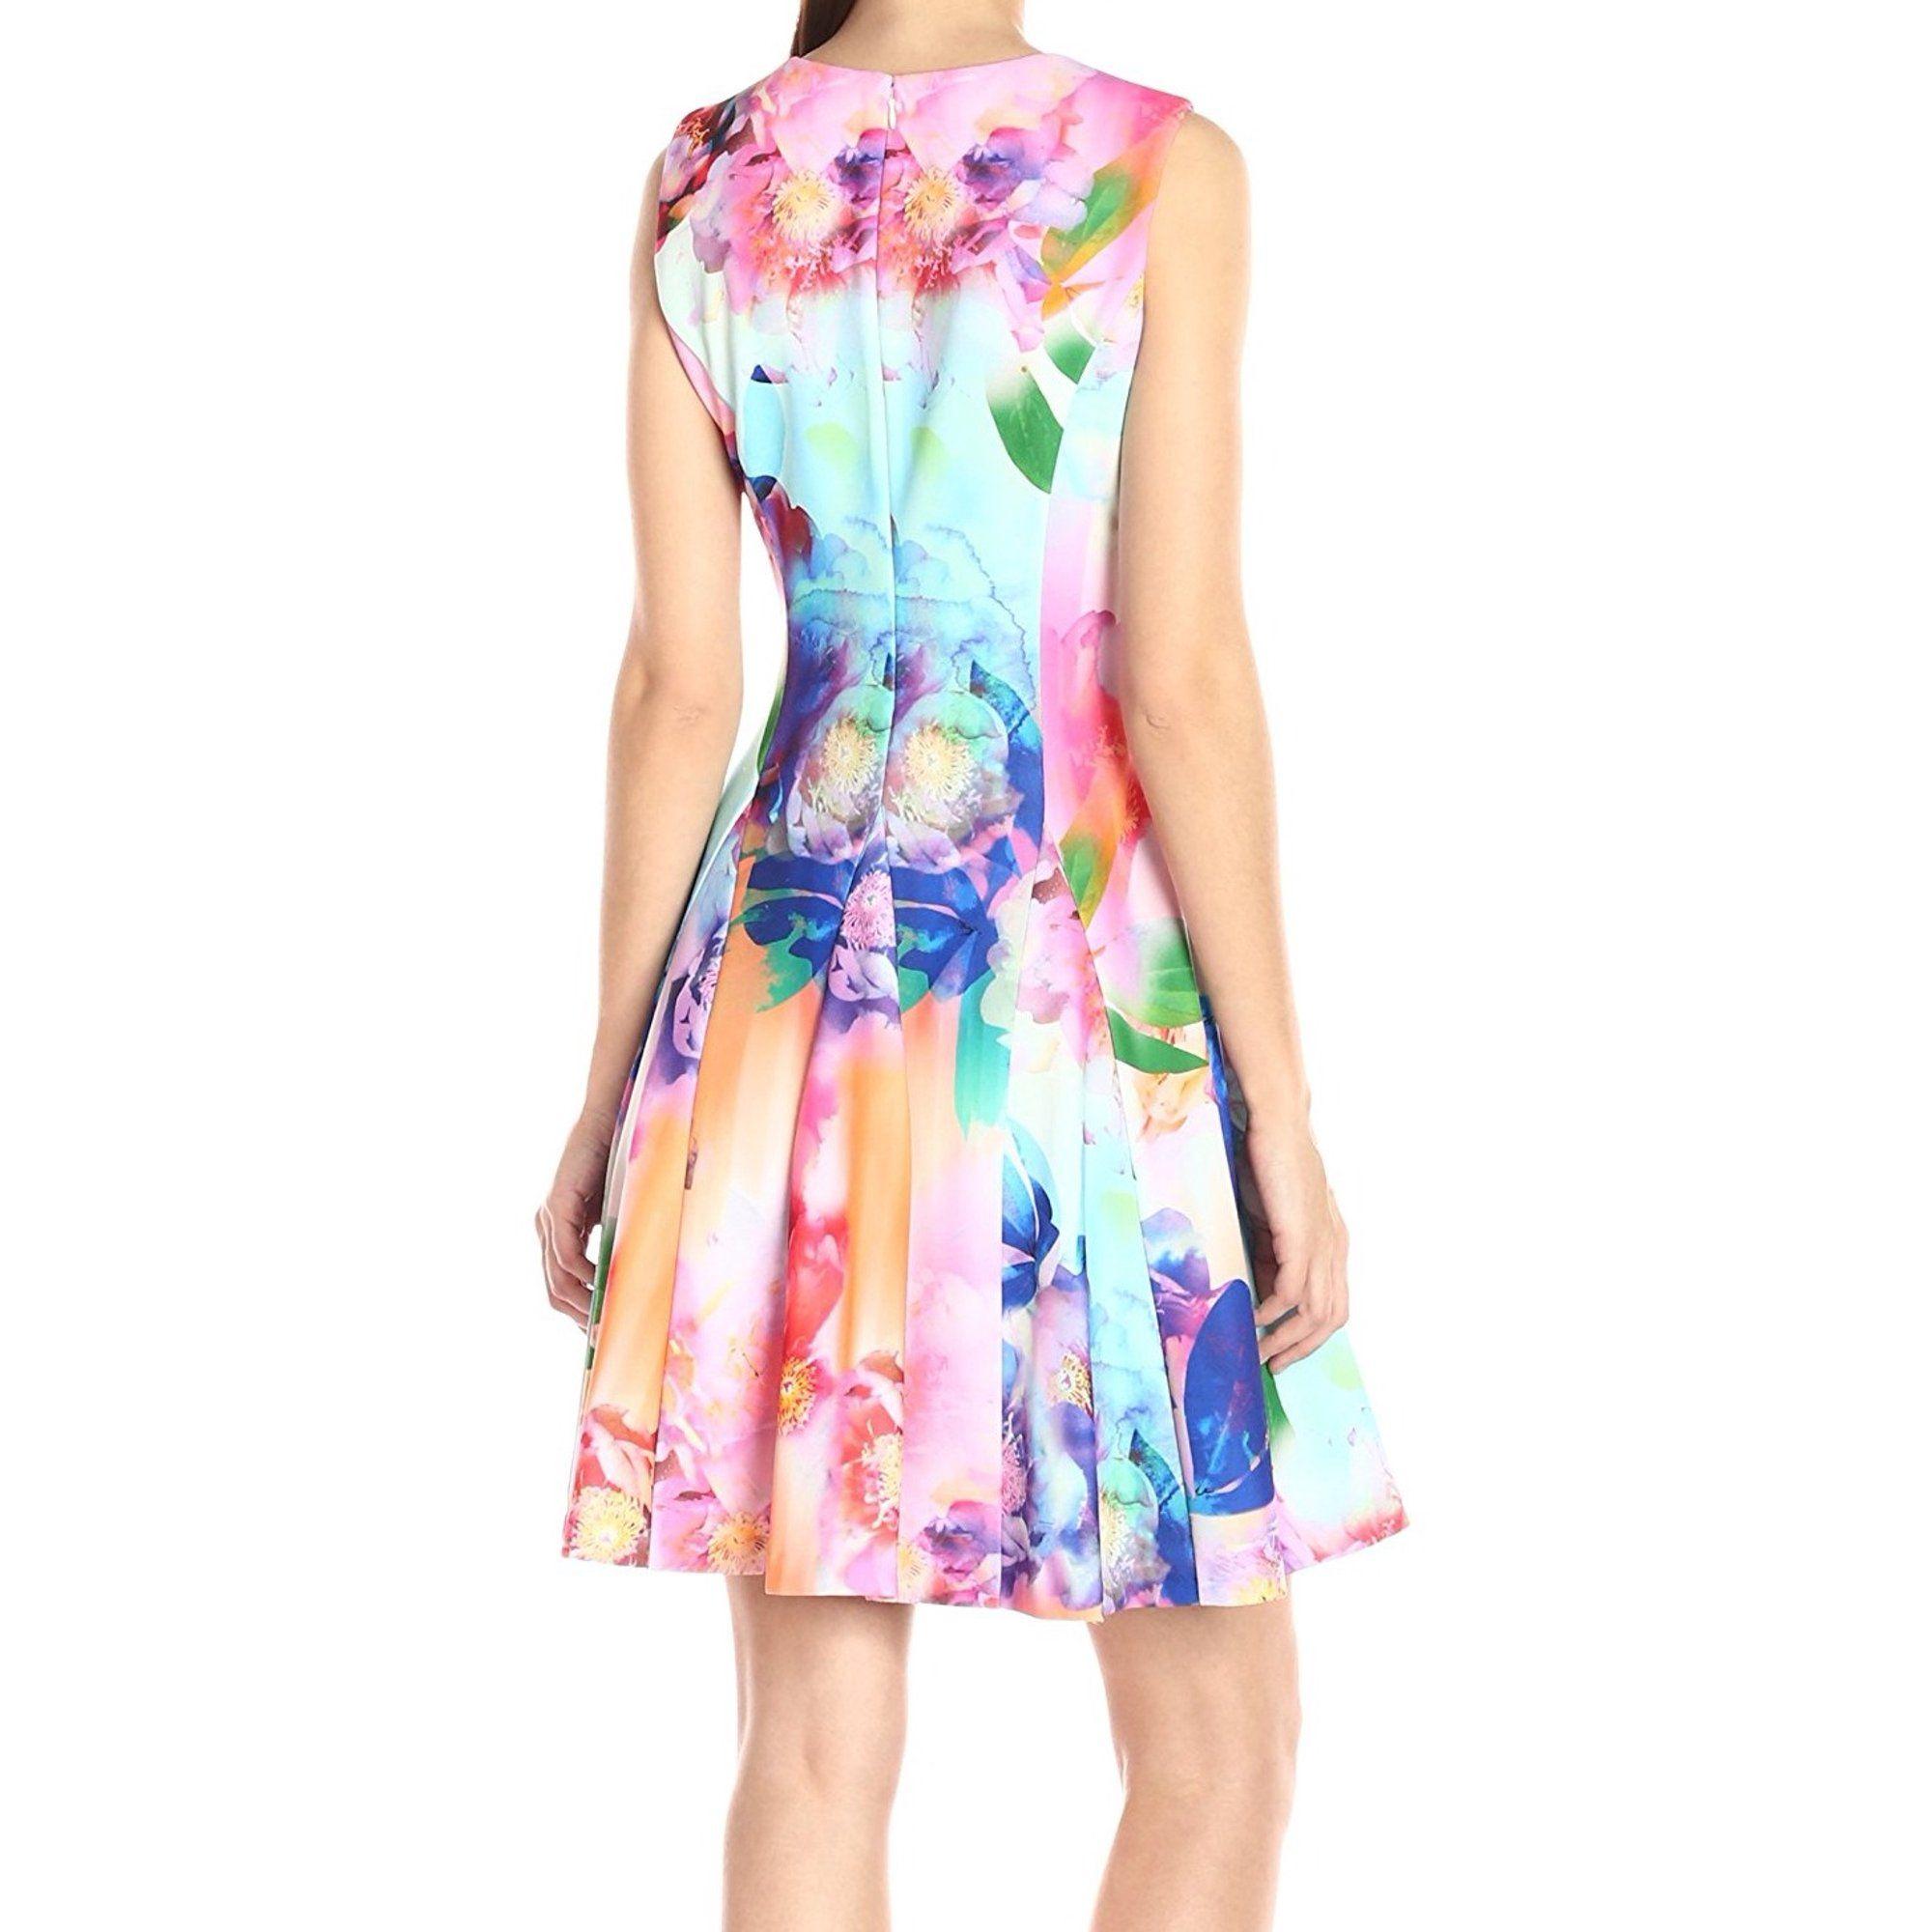 Calvin Klein Calvin Klein New Pink Womens Size 12 Floral Print Crewneck Sheath Dress Walmart Com Dresses Sheath Dress Floral Fit [ 2000 x 2000 Pixel ]